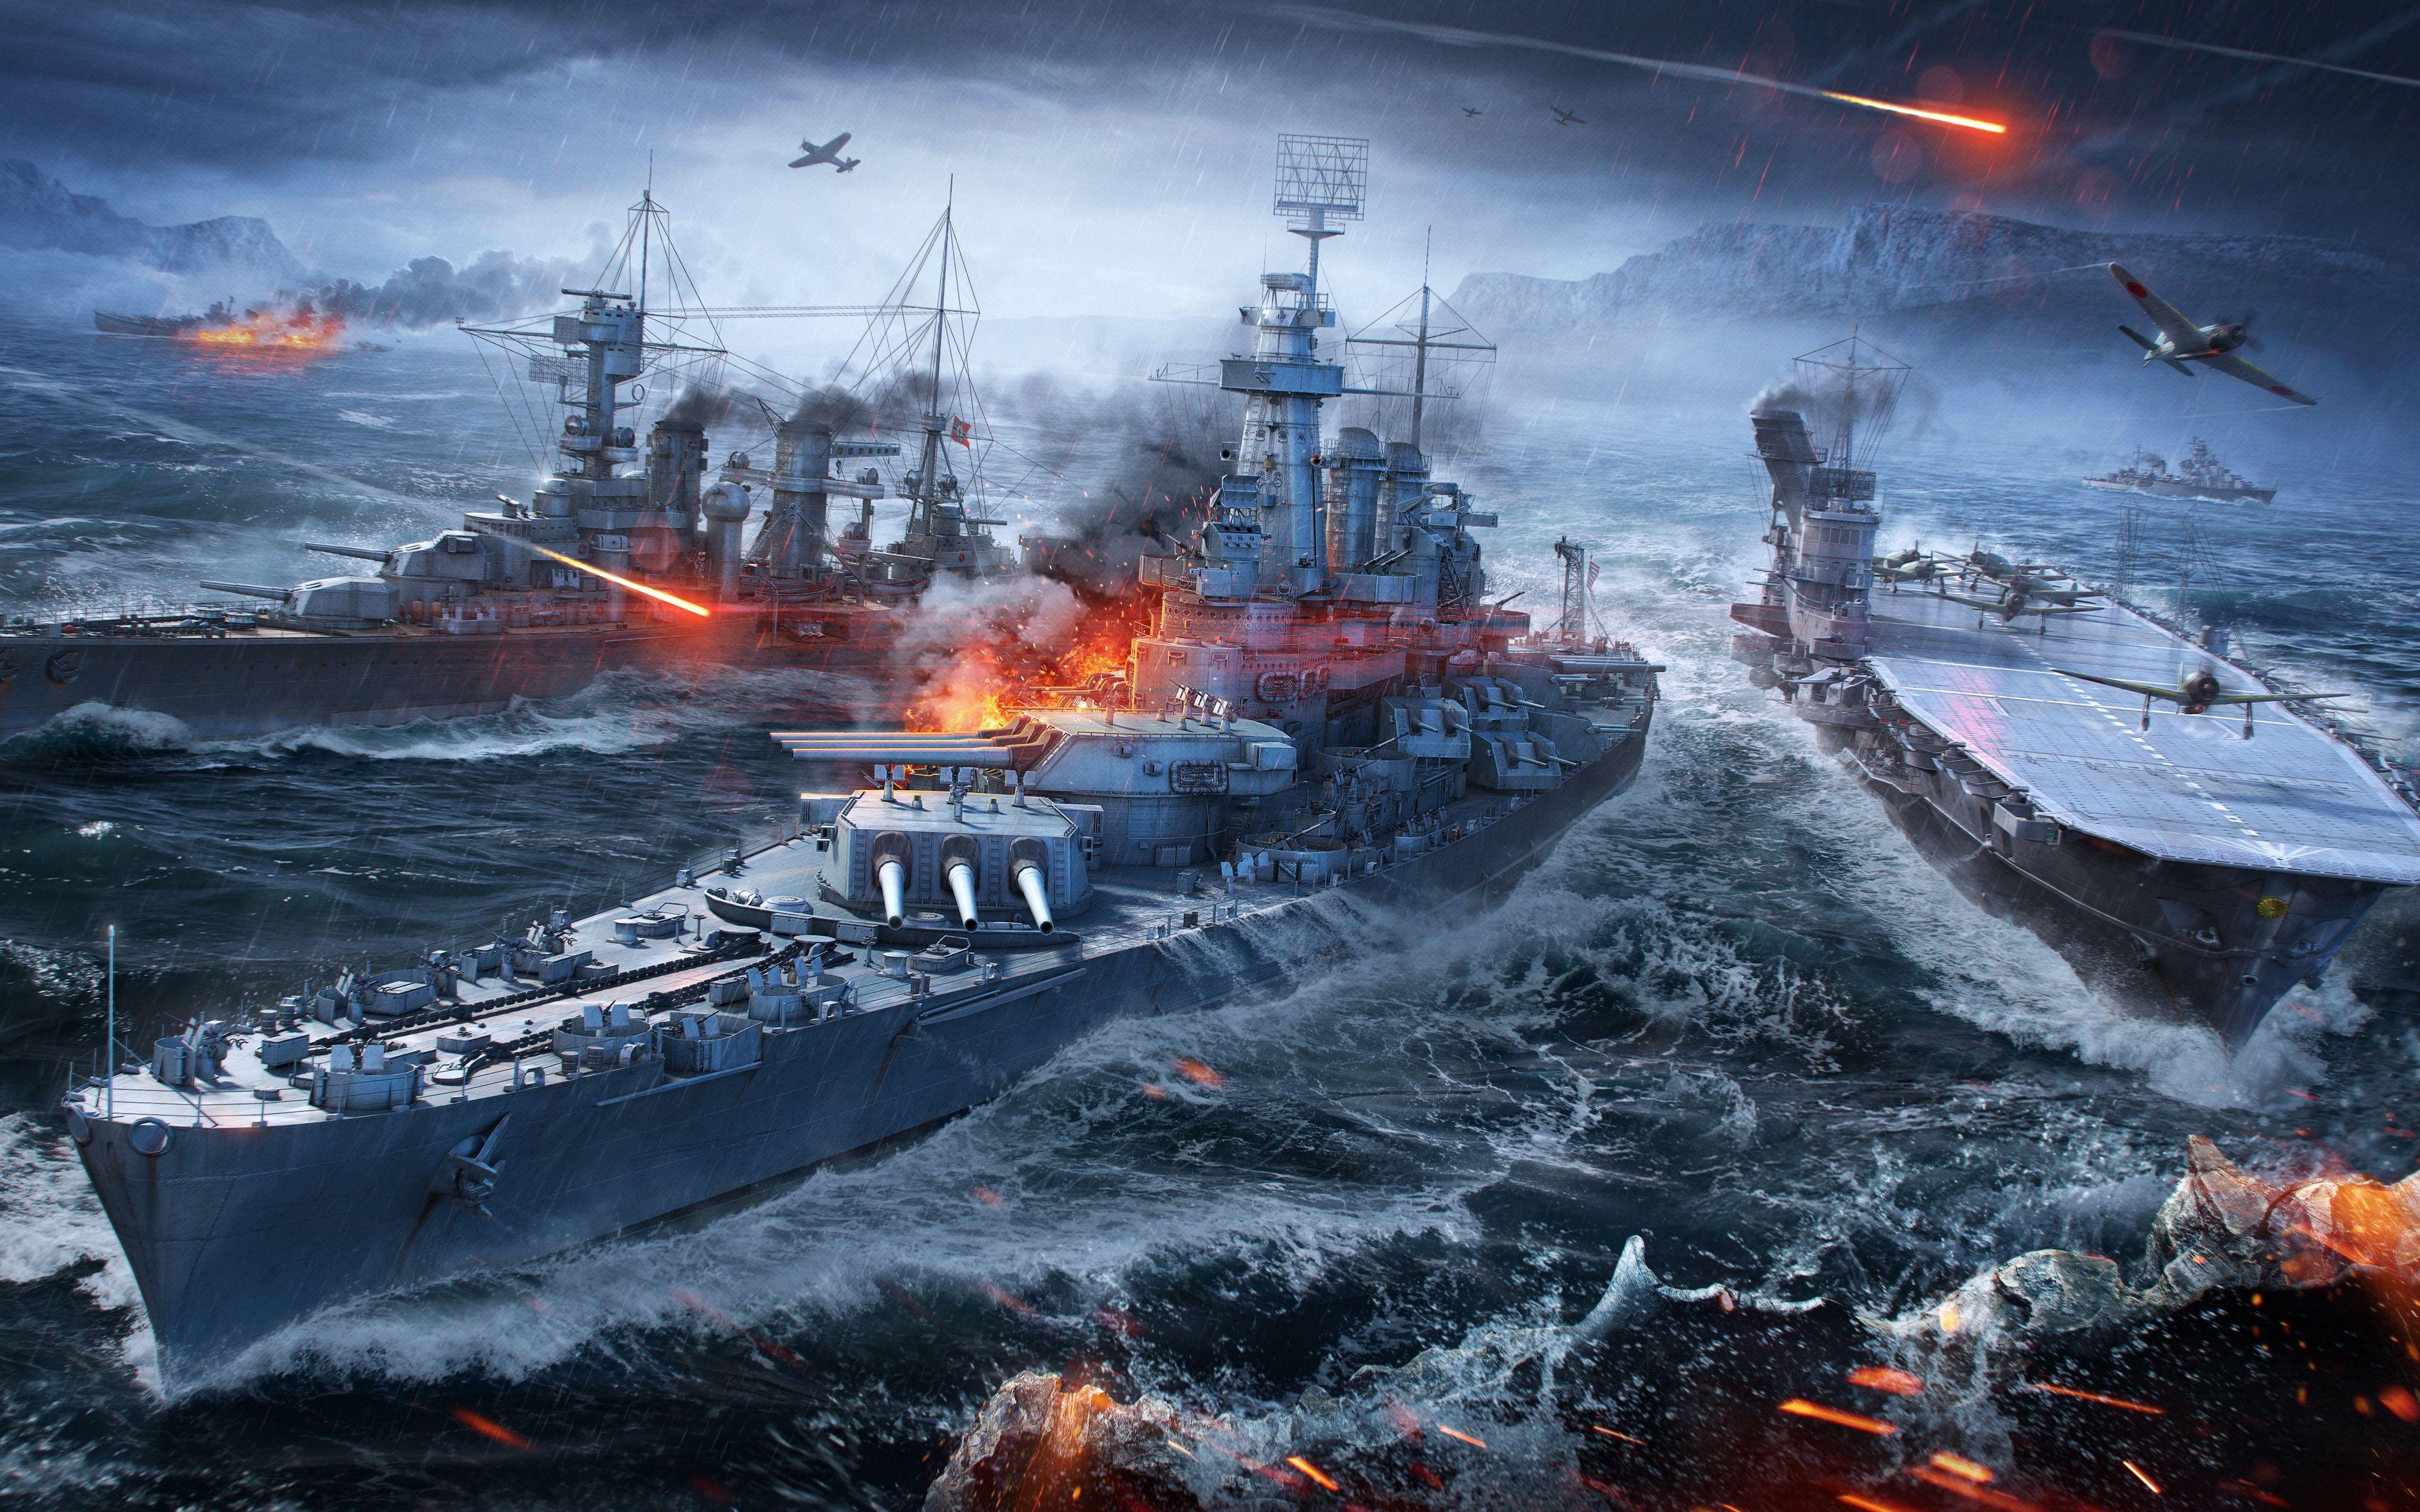 Download Wallpaper 3840x2400 World Of Warships Wargaming Net Ships Sea 4k Ultra Hd 16 10 Hd Background World Of Warships Wallpaper Warship Battleship